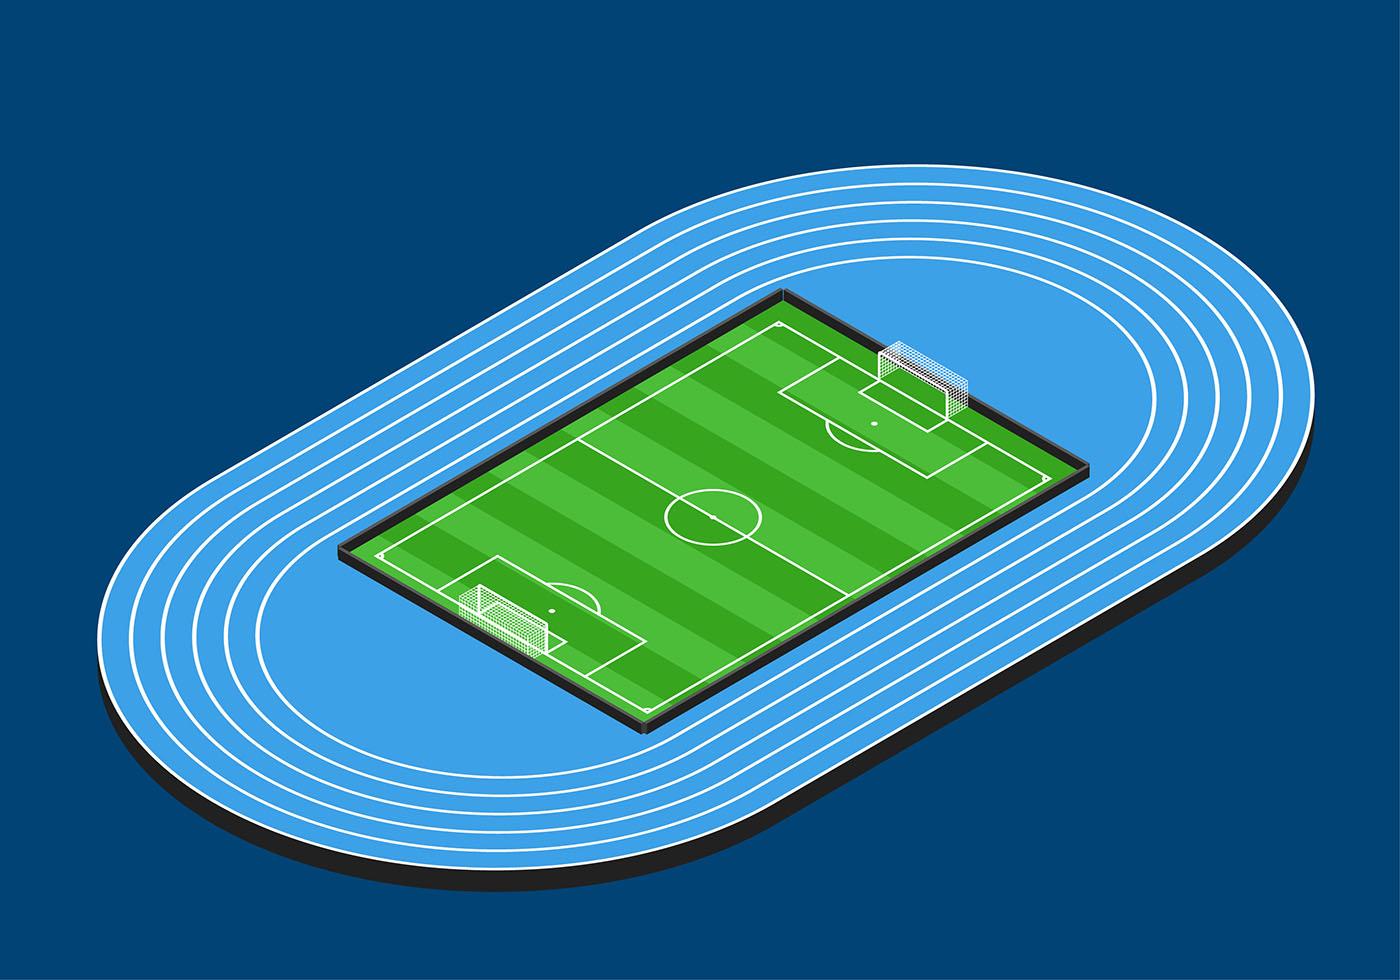 Soccer Field Isometric Vector - Download Free Vector Art ...